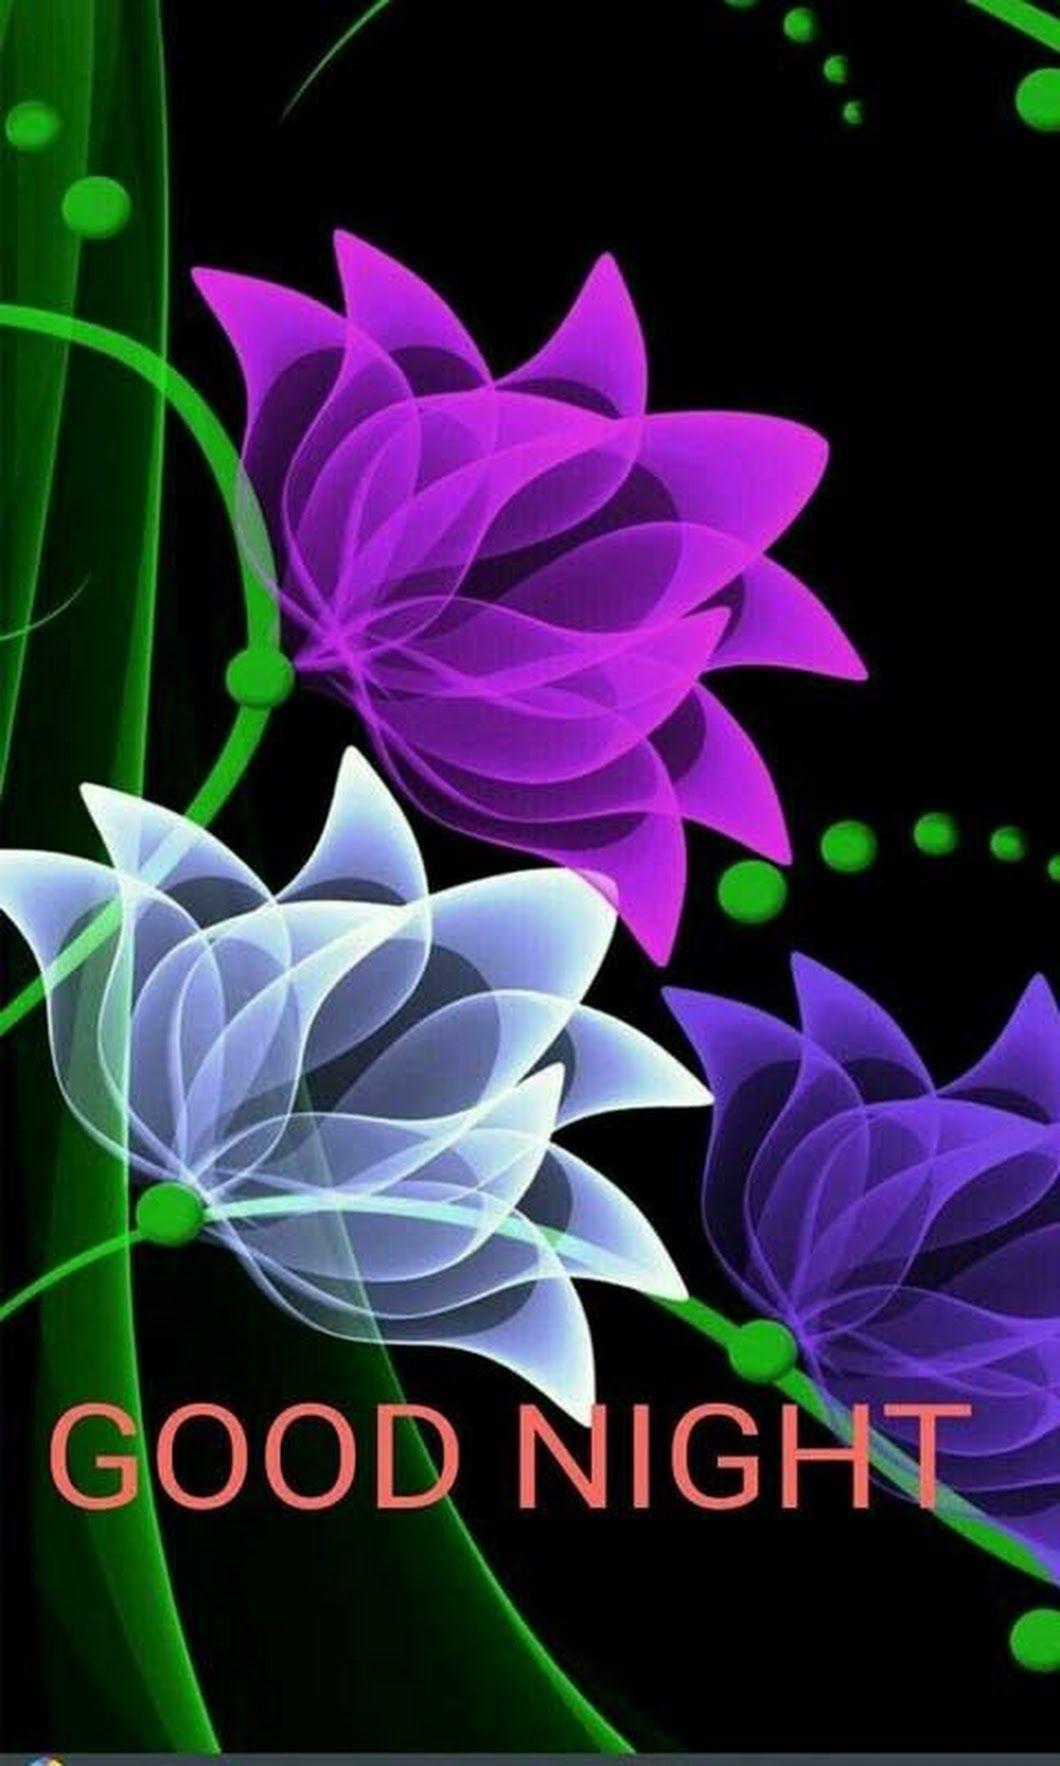 Sign in   Good night sweet dreams, Good night greetings, Good night